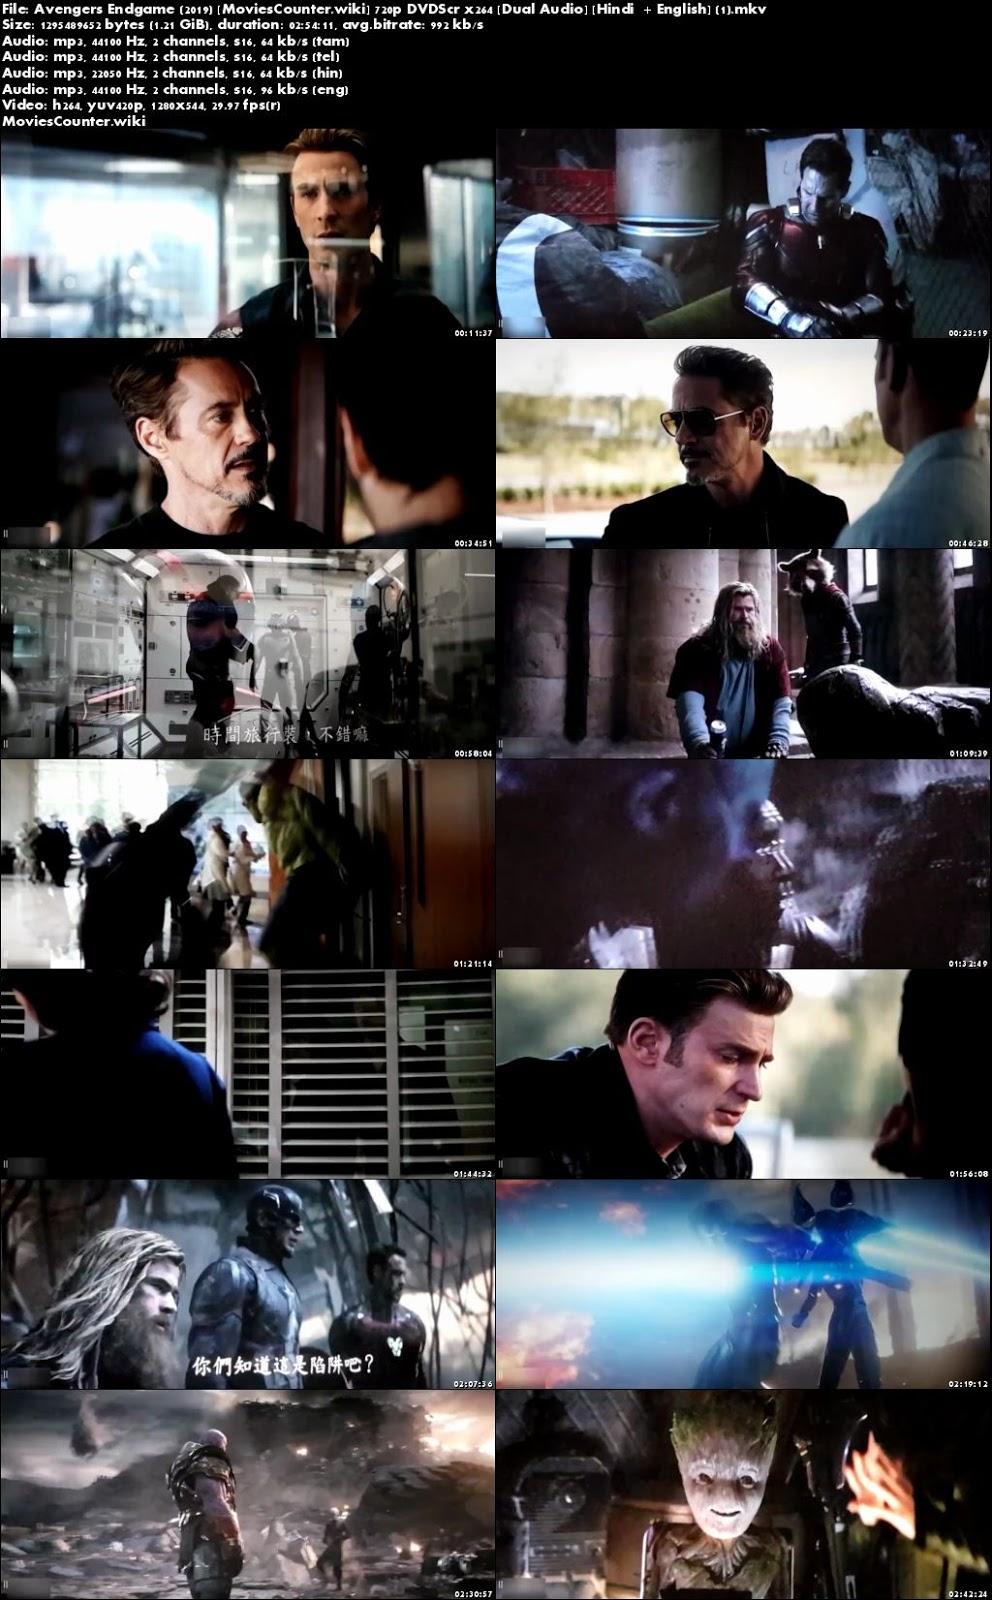 Screen Shots Avengers: Endgame 2019 Dual Audio HD 720p